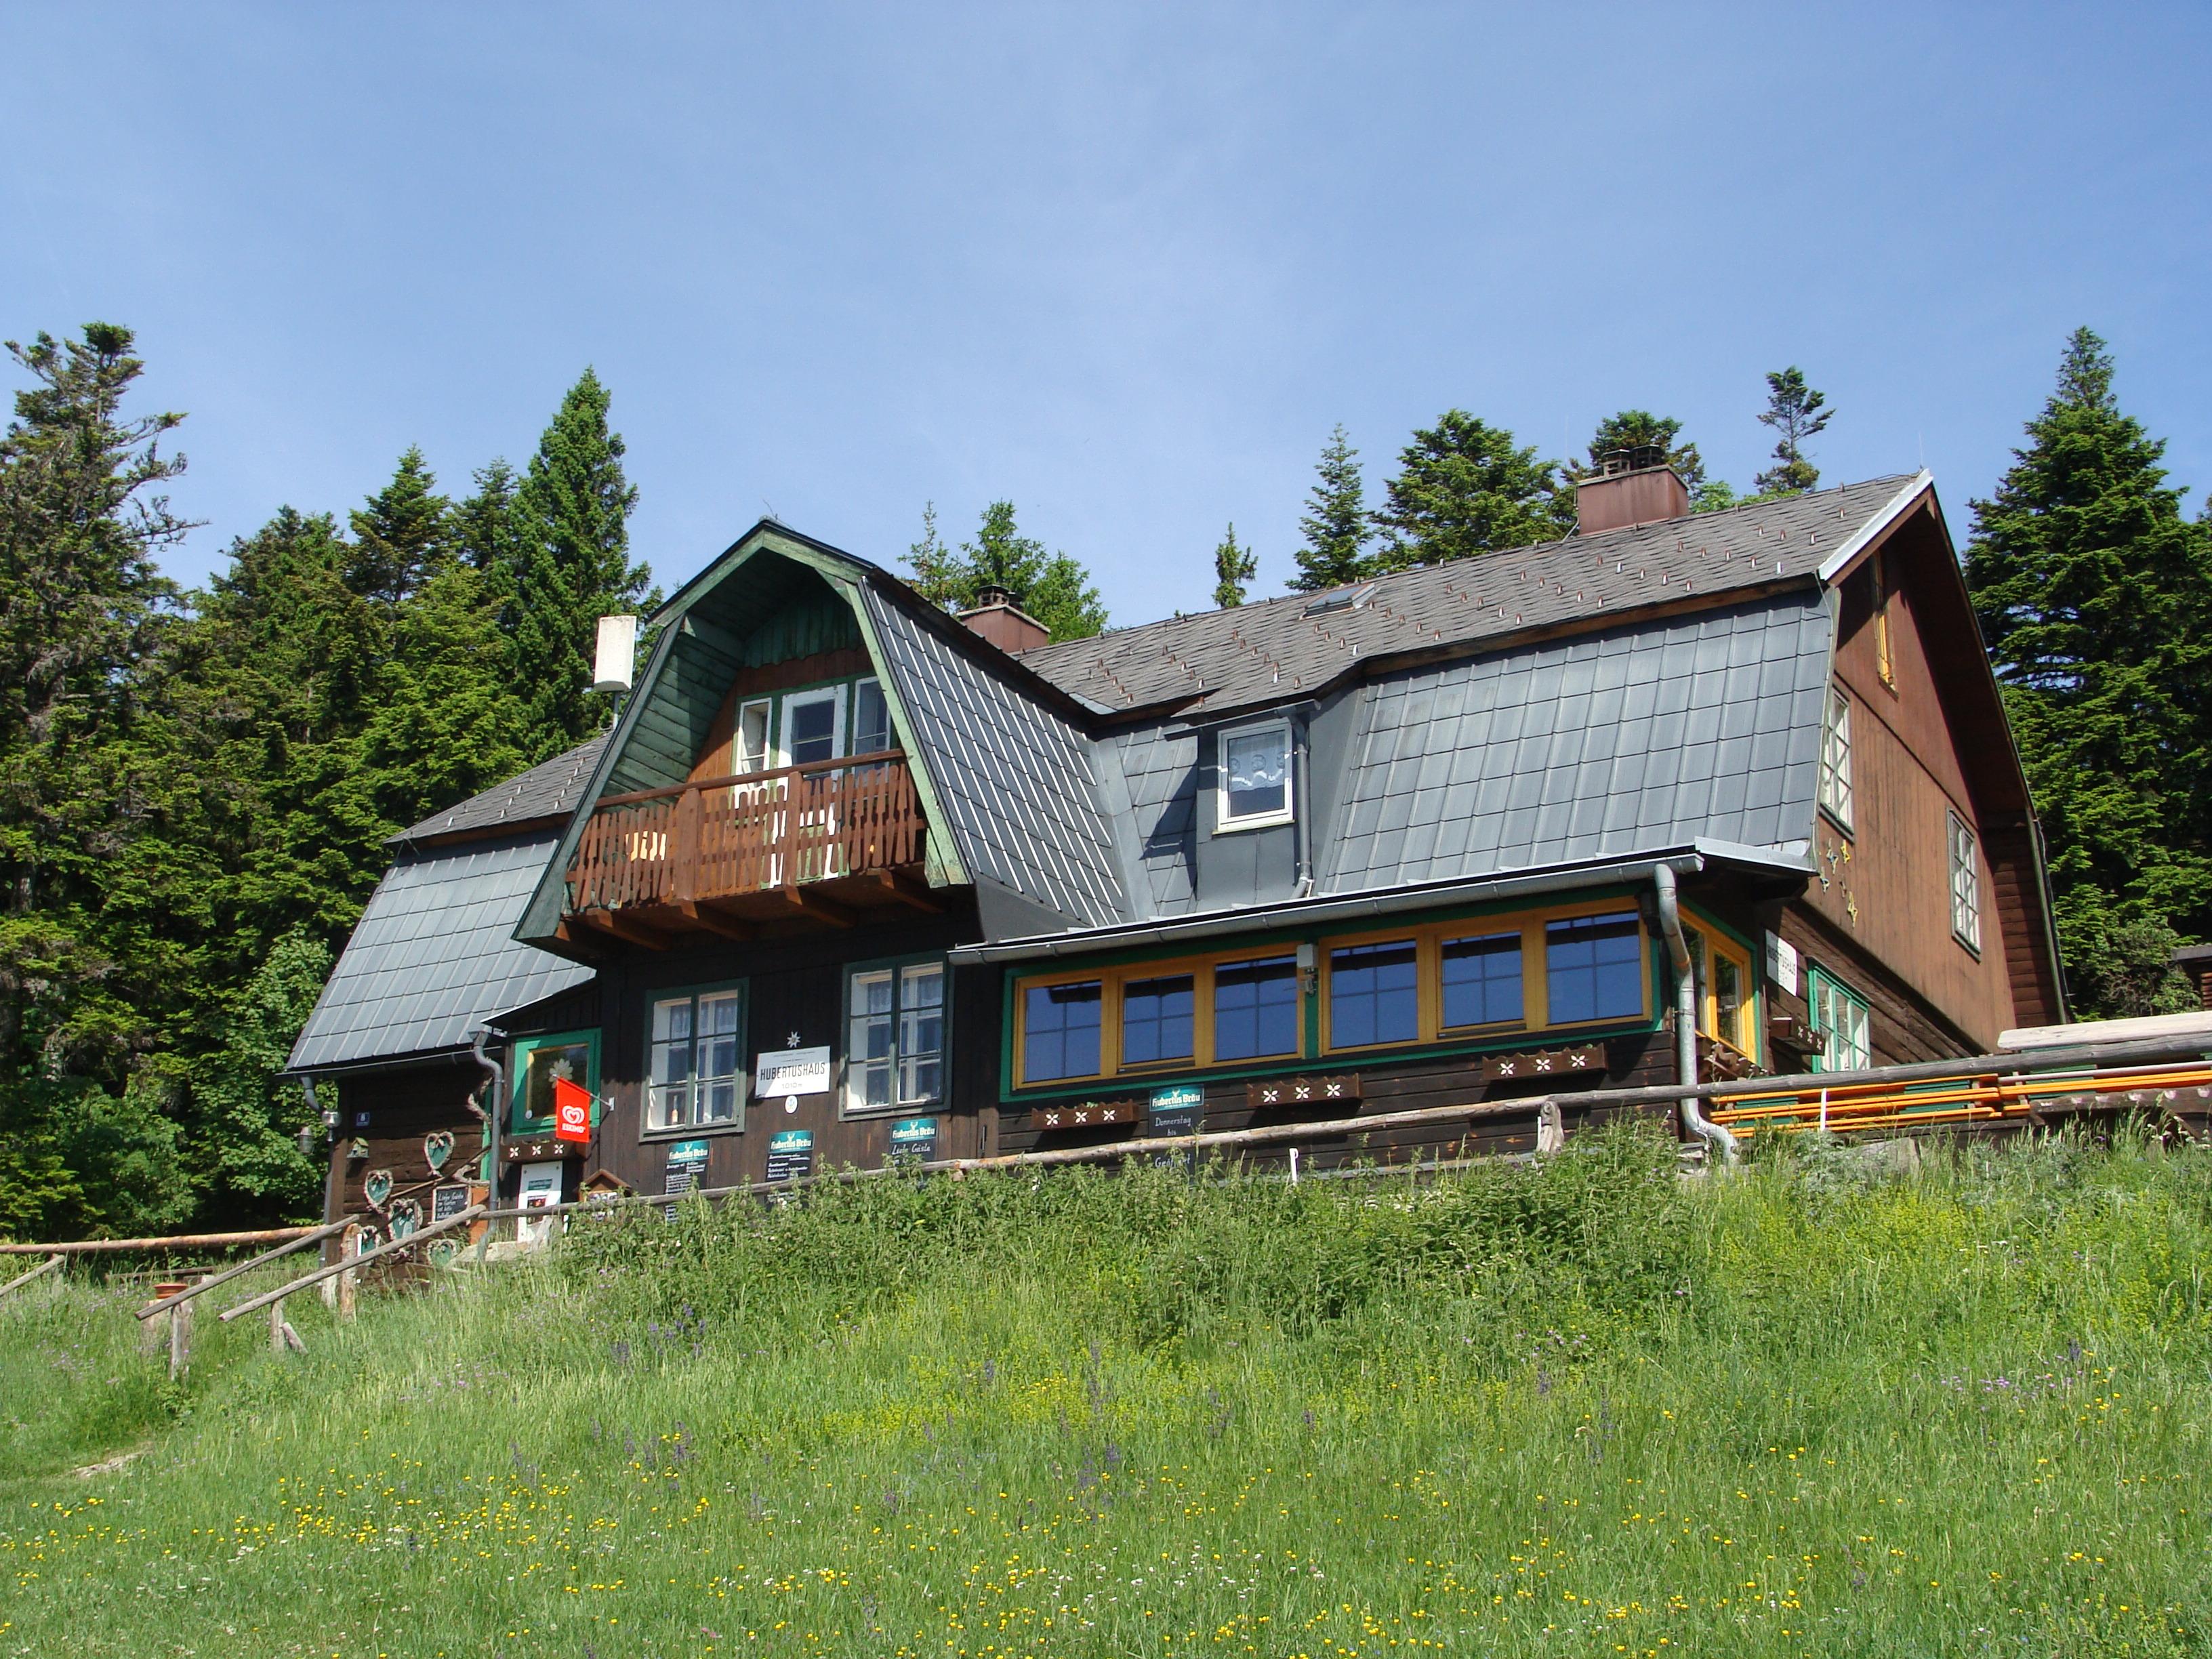 Gebirgsverein-Hüttenrätsel im Juli